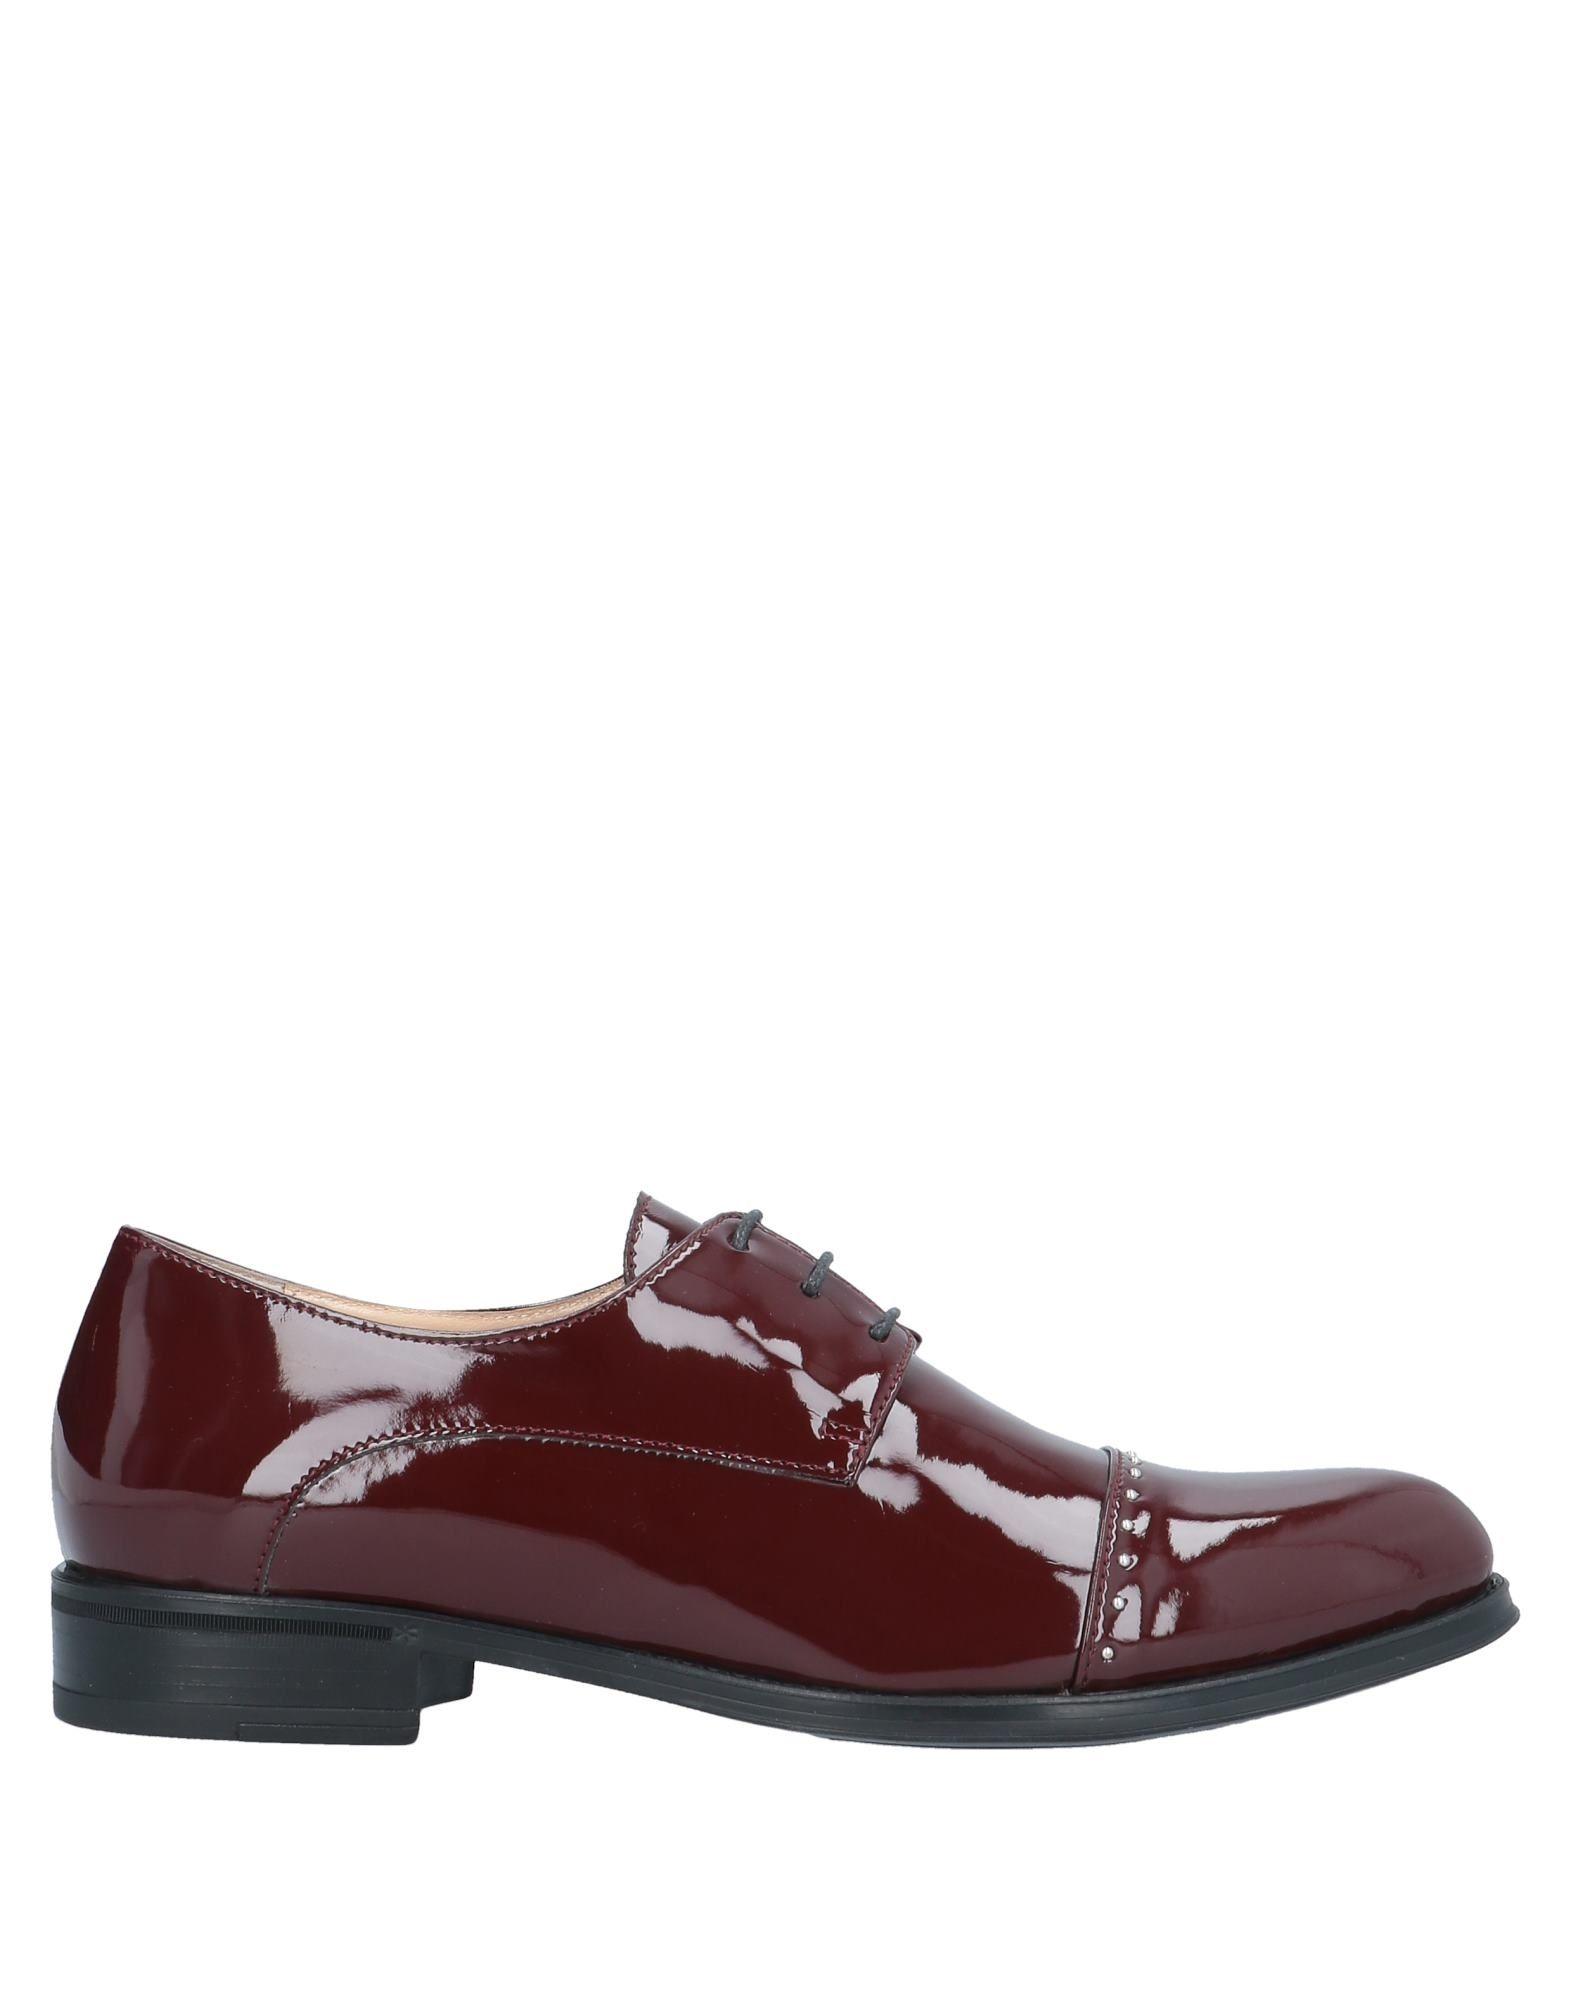 мужская обувь утепленная